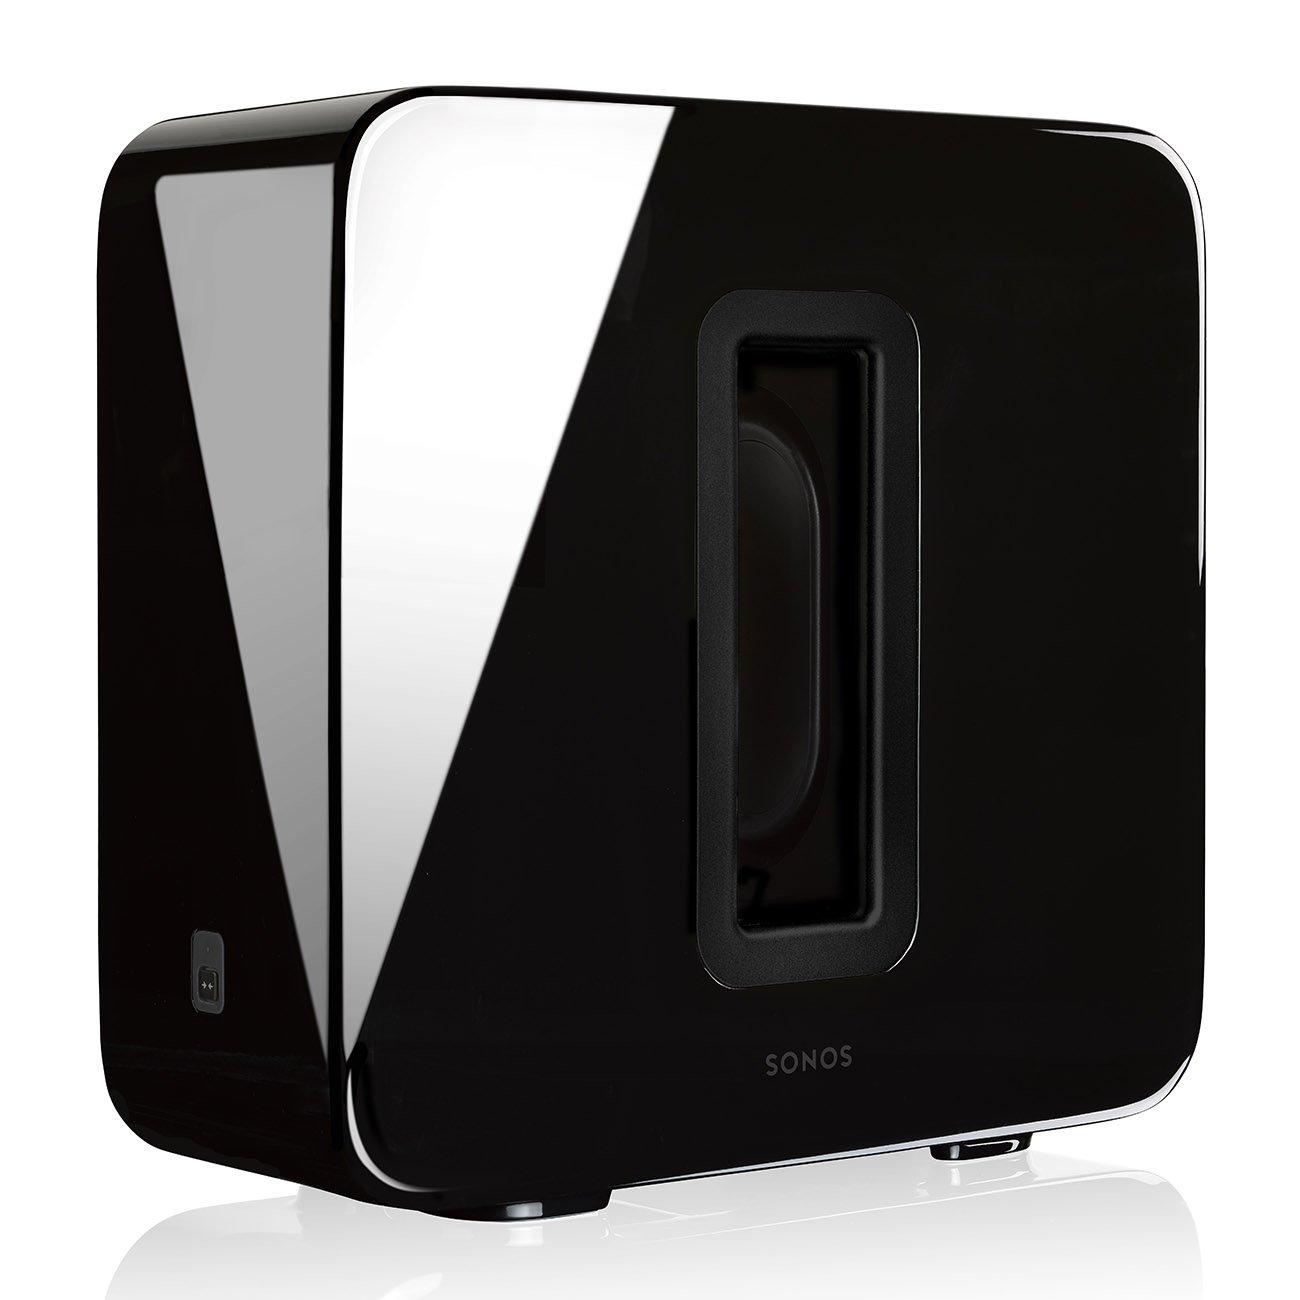 Sonos SUB Wireless Subwoofer (Black) by Sonos